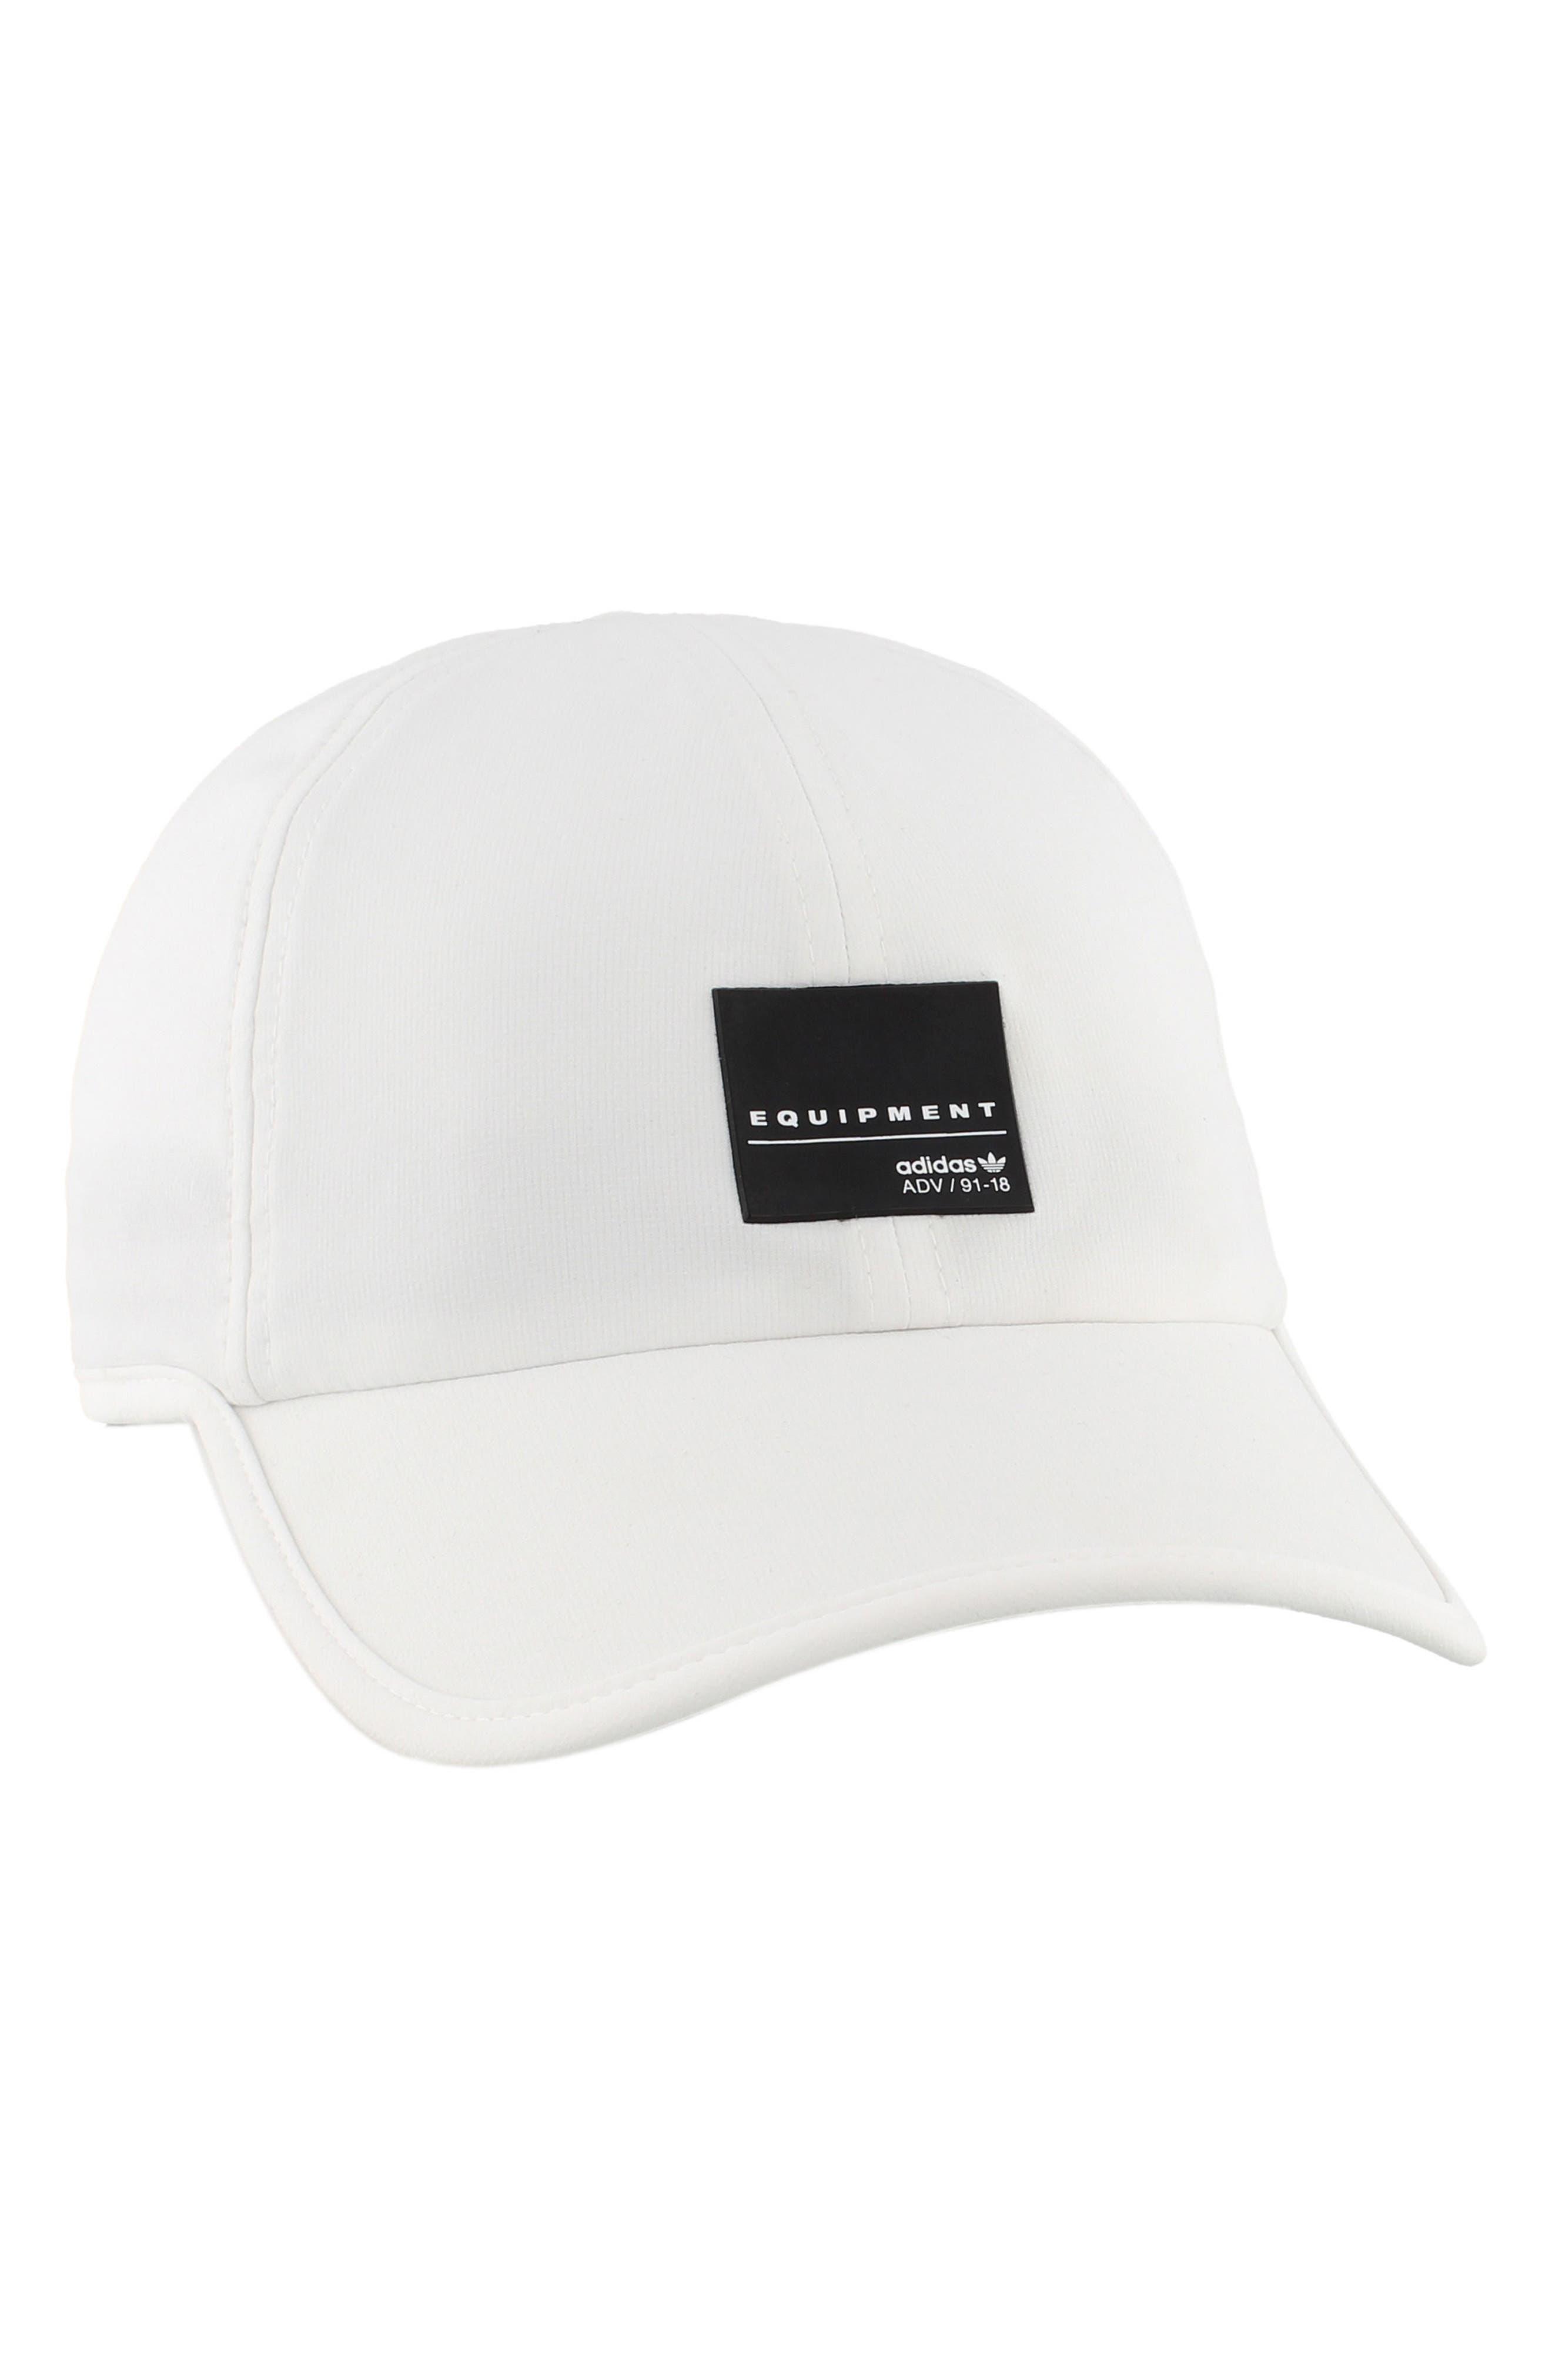 EQT Trainer Cap,                             Alternate thumbnail 2, color,                             WHITE